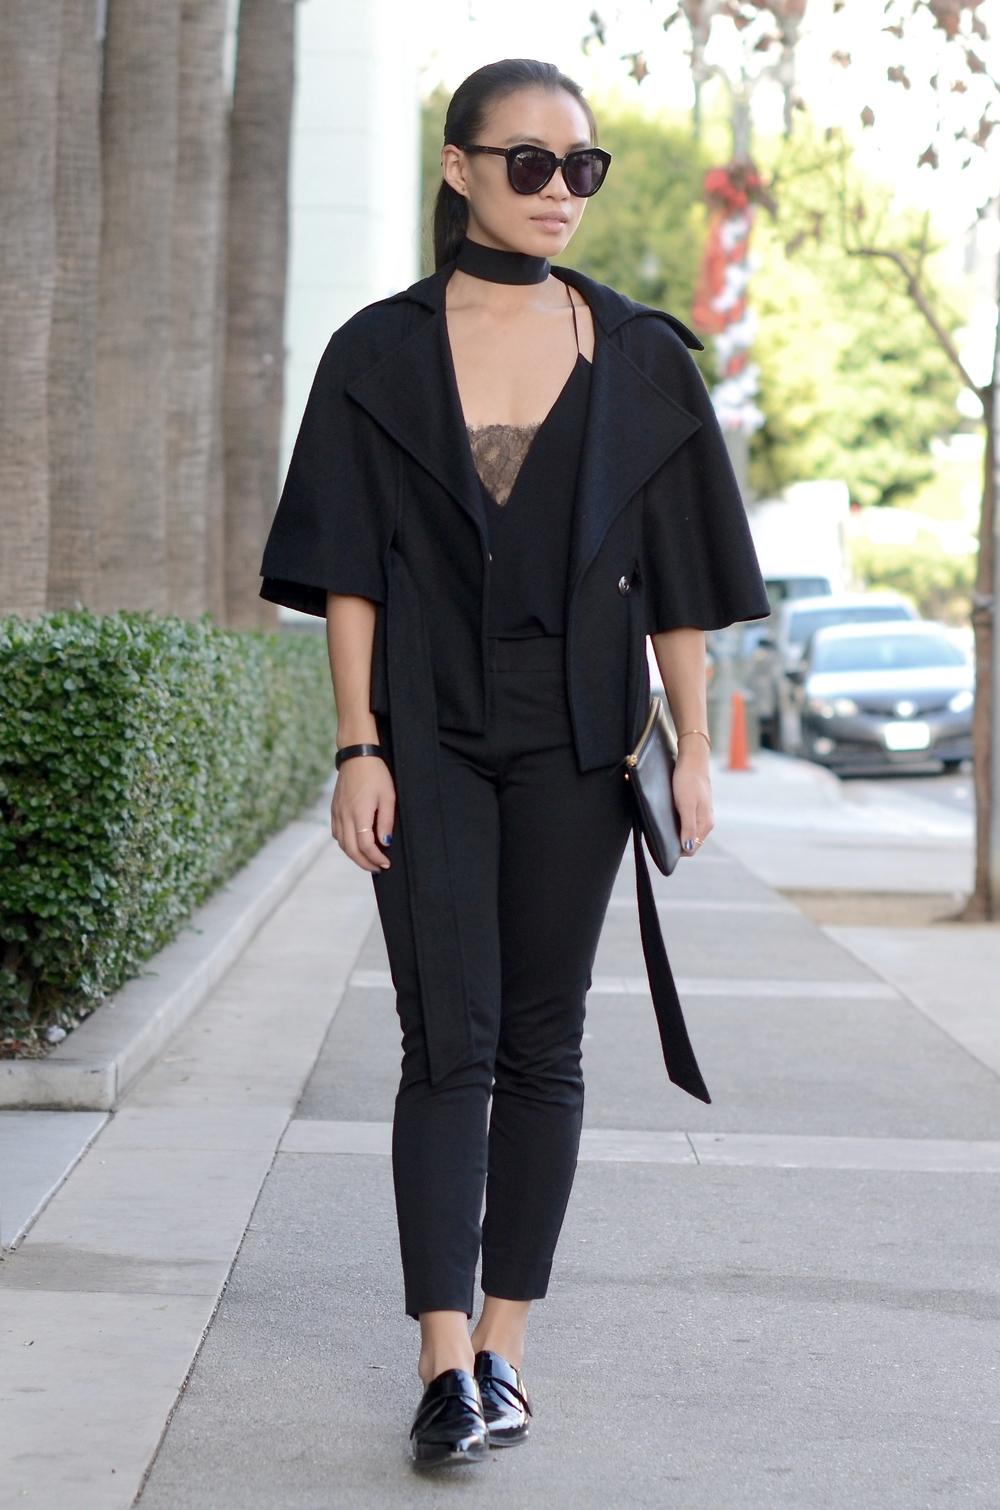 Just Goh With It-Outfit-zara-black-lace-top-gap-pants-max-mara-coat-cape-celine-3.jpg